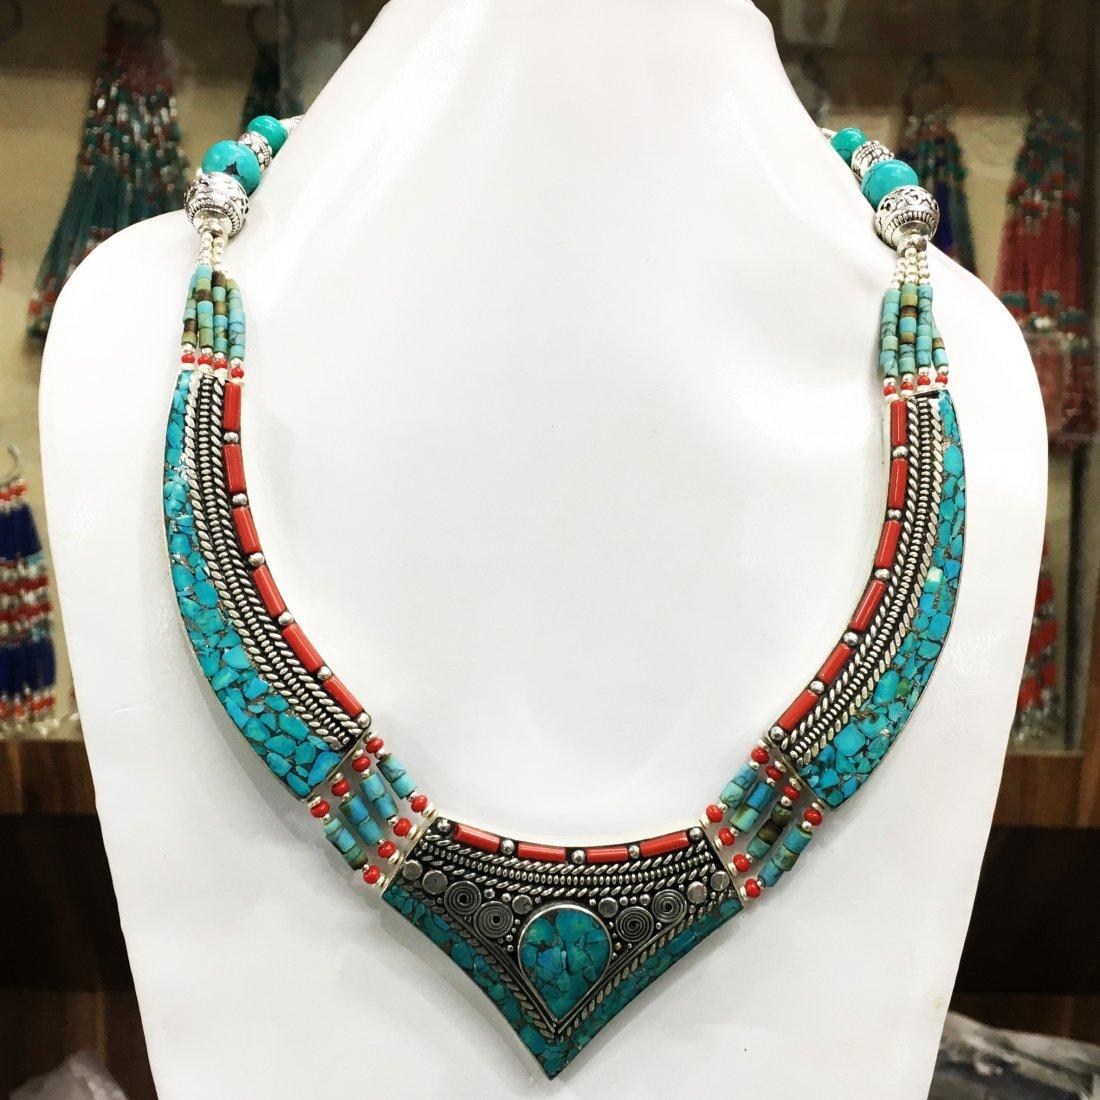 Boho Ethnic Antique Choker Handmade Necklace